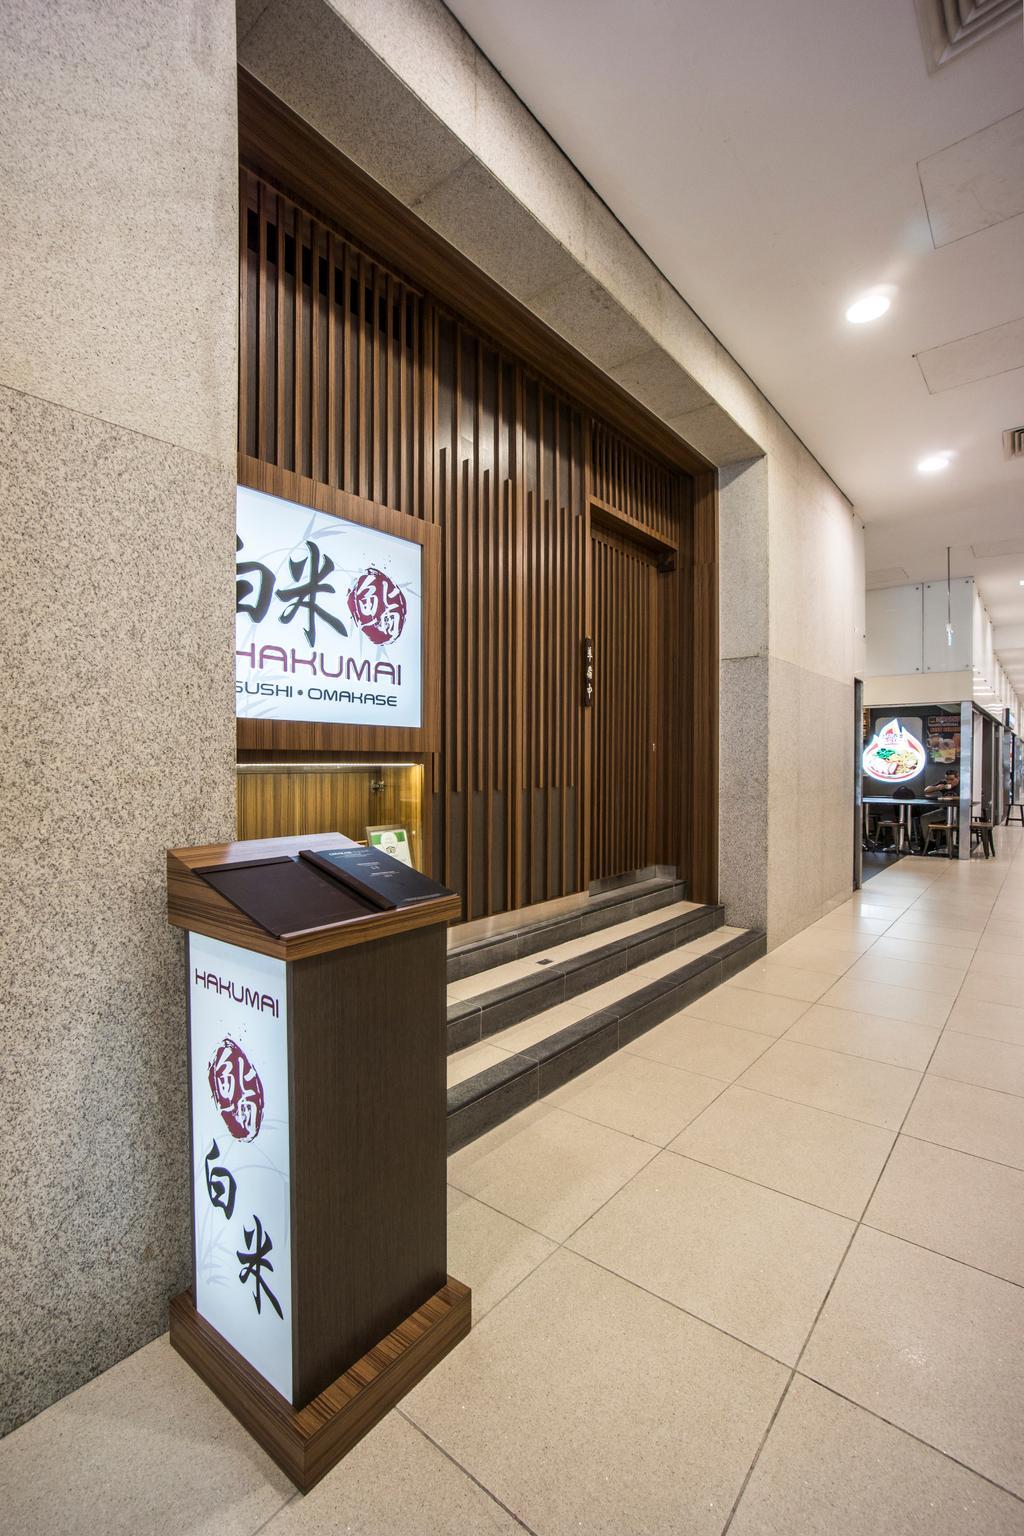 Hakumai, Commercial, Interior Designer, Flo Design, Contemporary